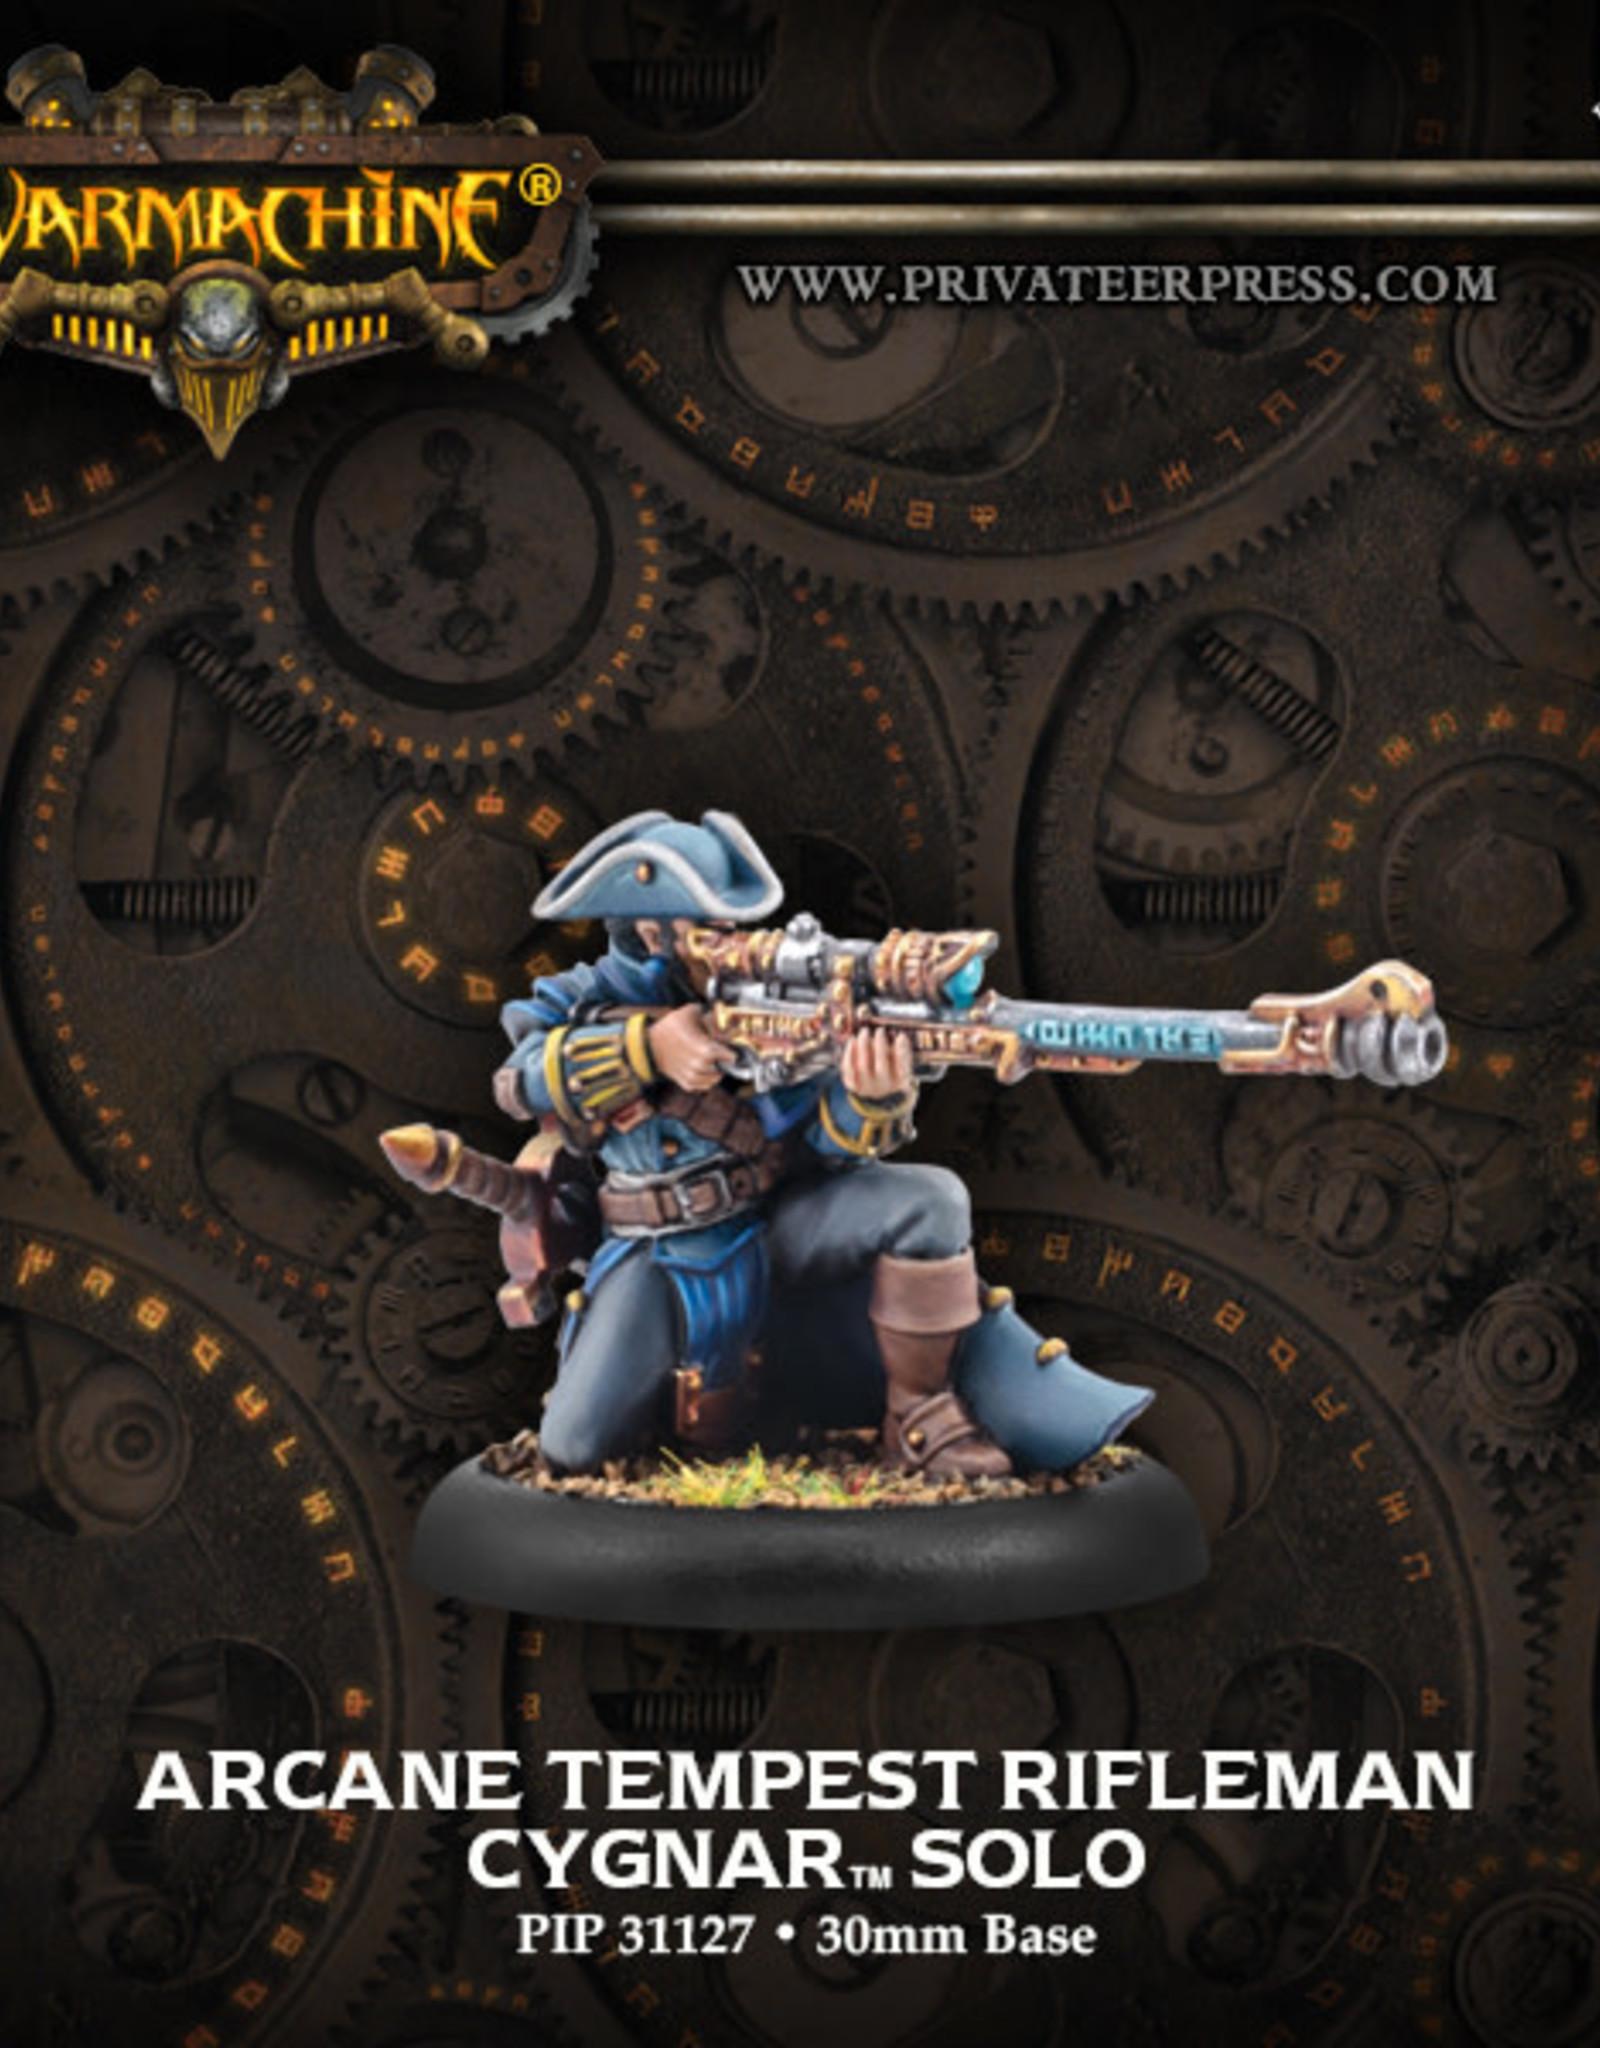 Warmachine Cygnar - Arcane Tempest Rifle